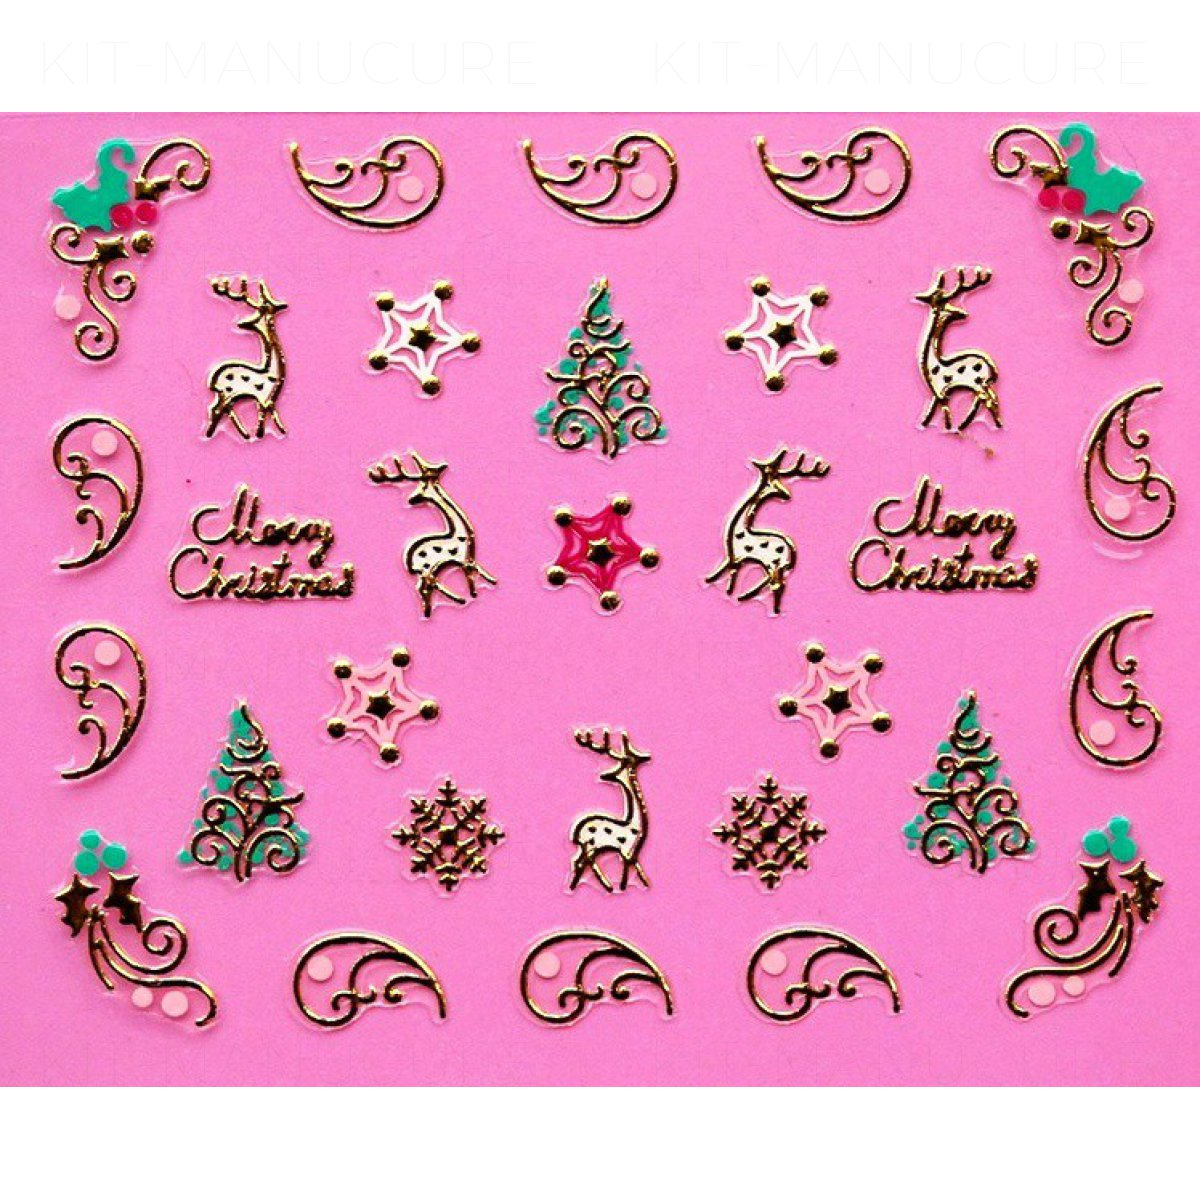 https://www.kit-manucure.com/752-thickbox_default/stickers-de-noël-flocons-sapin-reine-et-merry-christmas.jpg